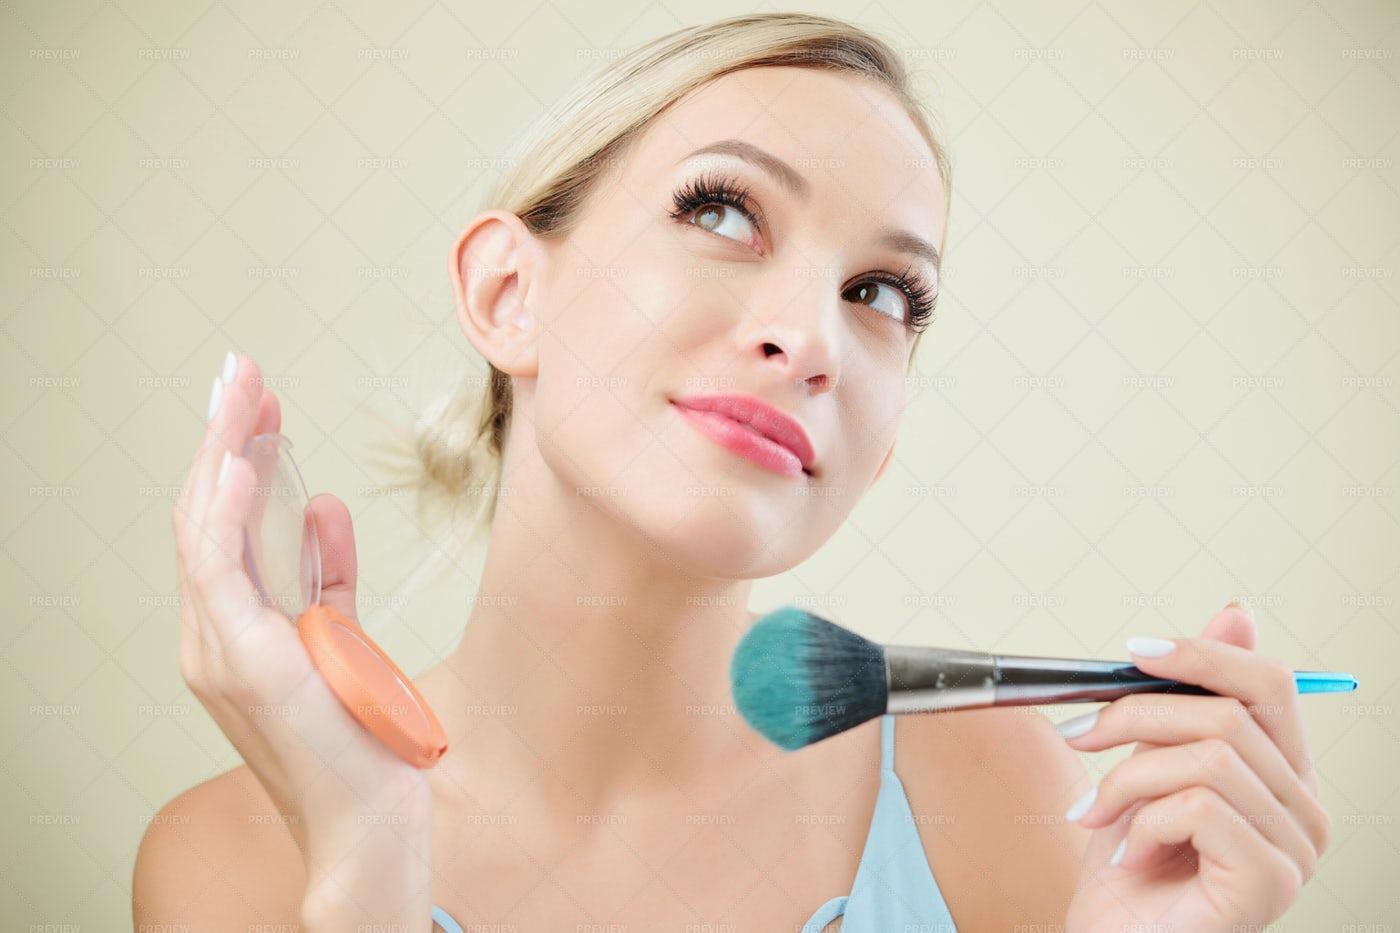 Pretty Woman Applying Blush: Stock Photos